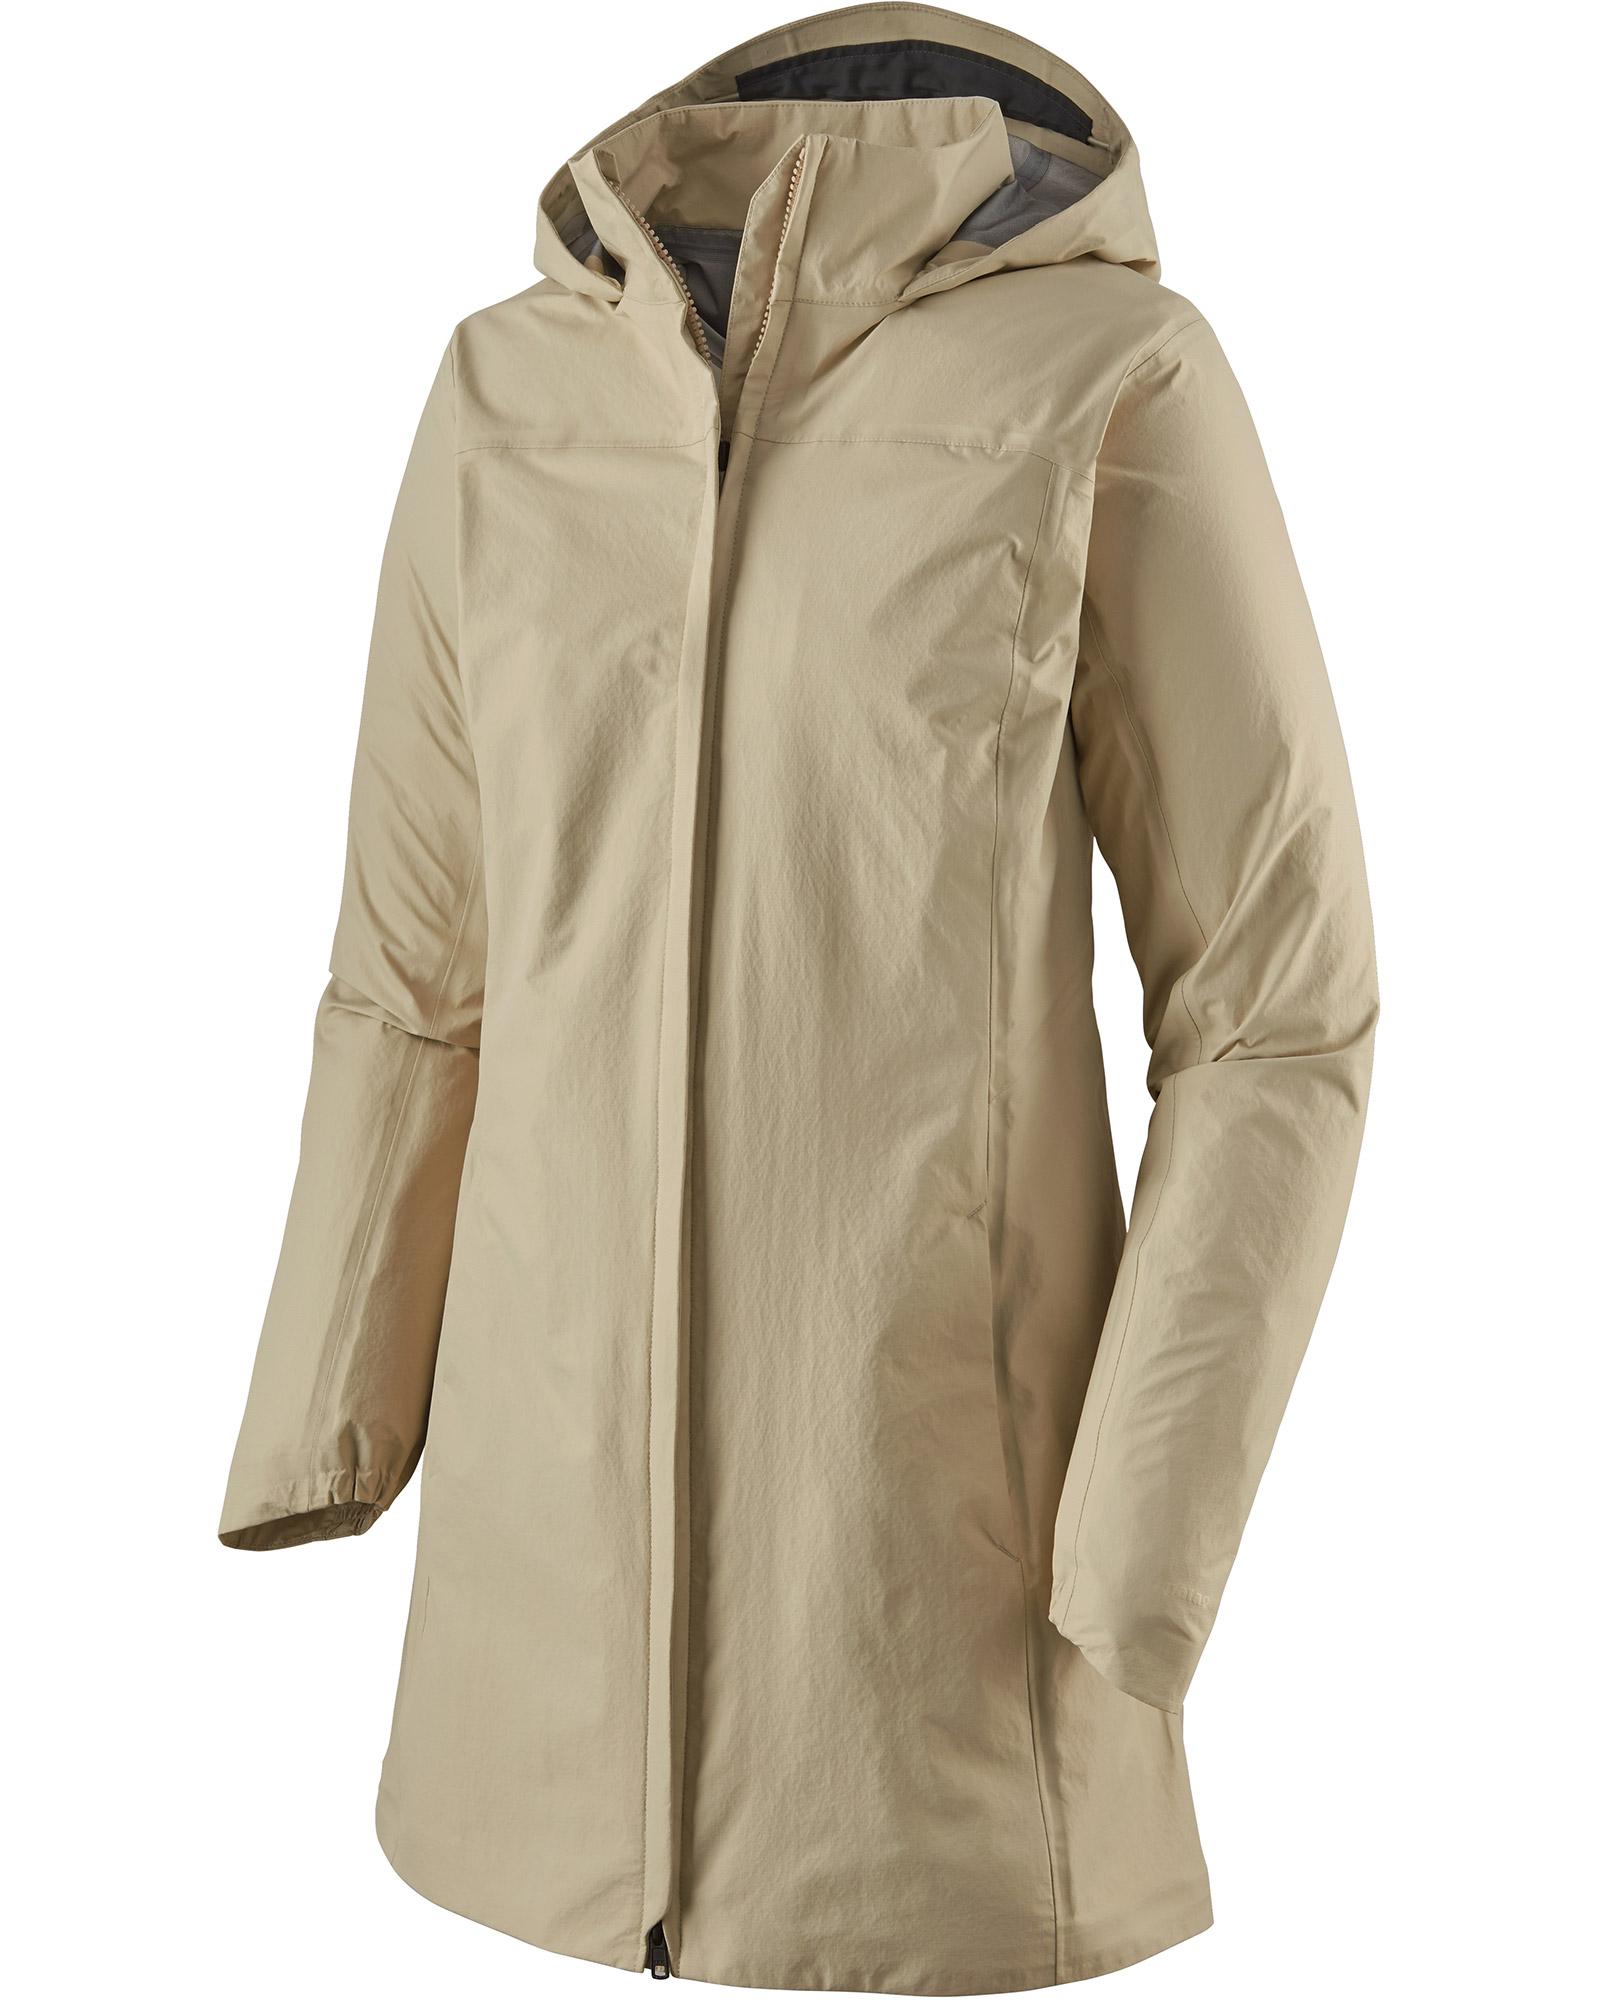 Patagonia Torrentshell City Women's Coat 0